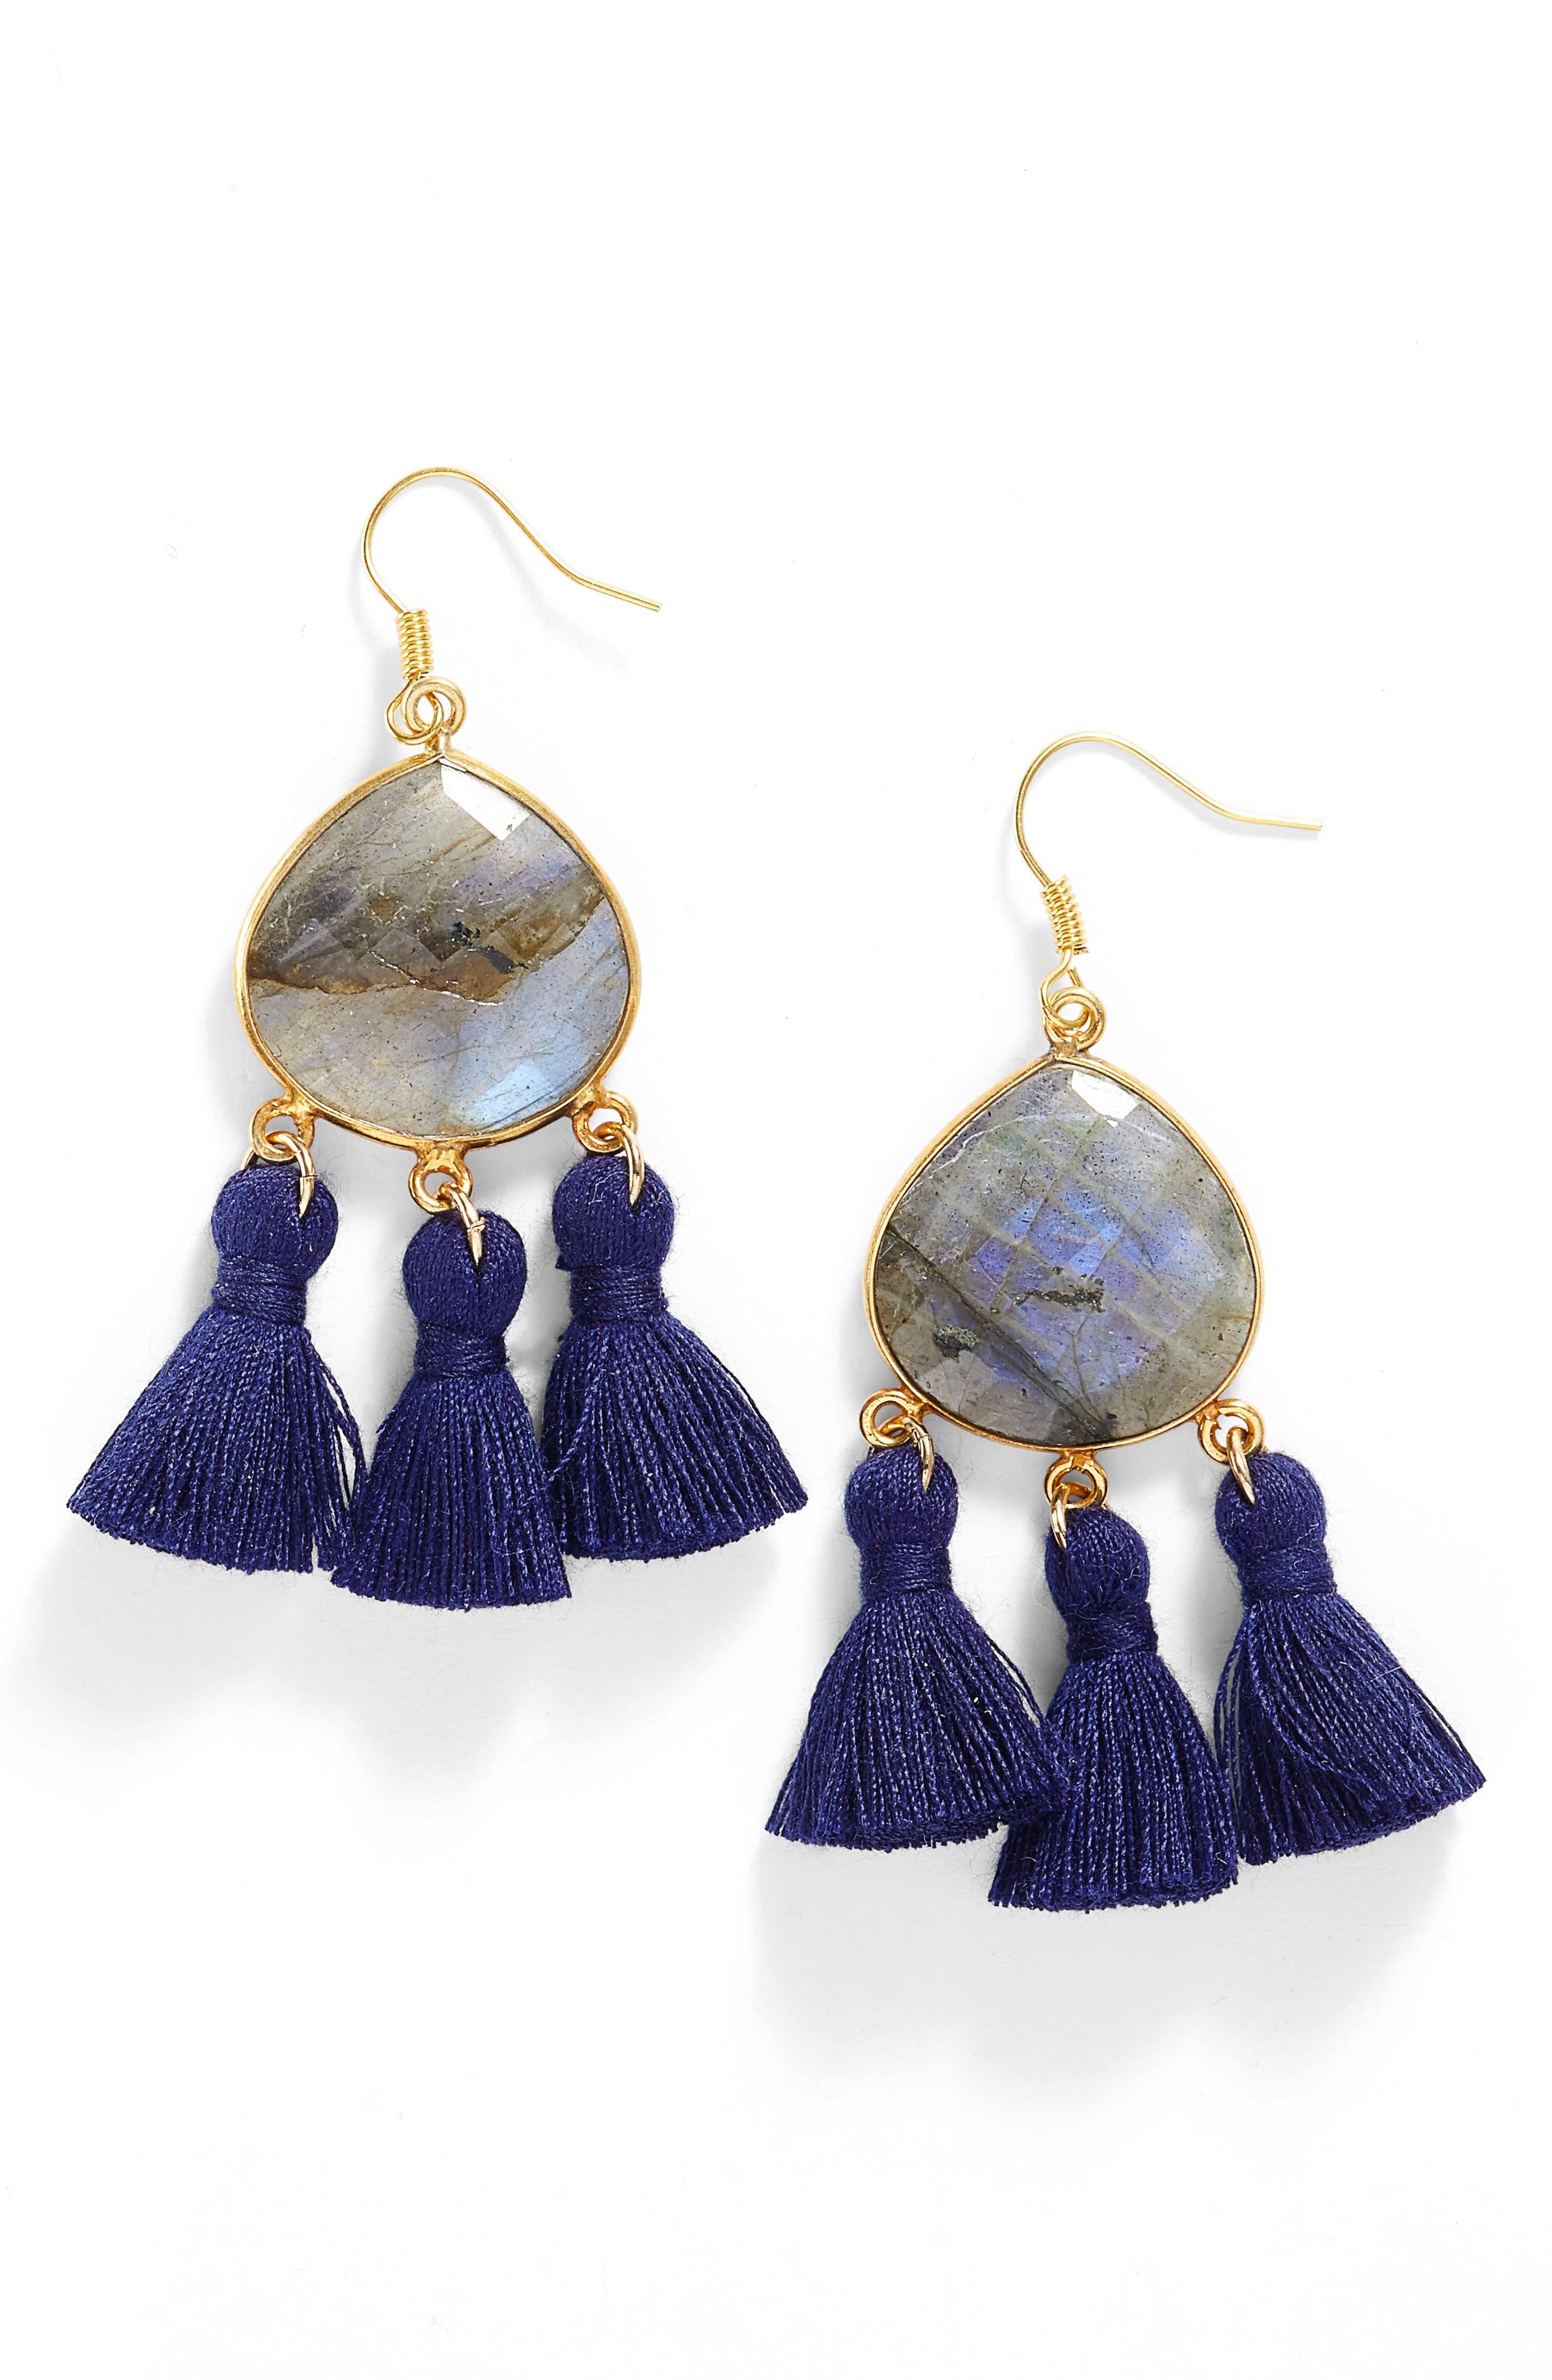 Main Image - Love's Affect Lacey Semiprecious Stone Tassel Earrings